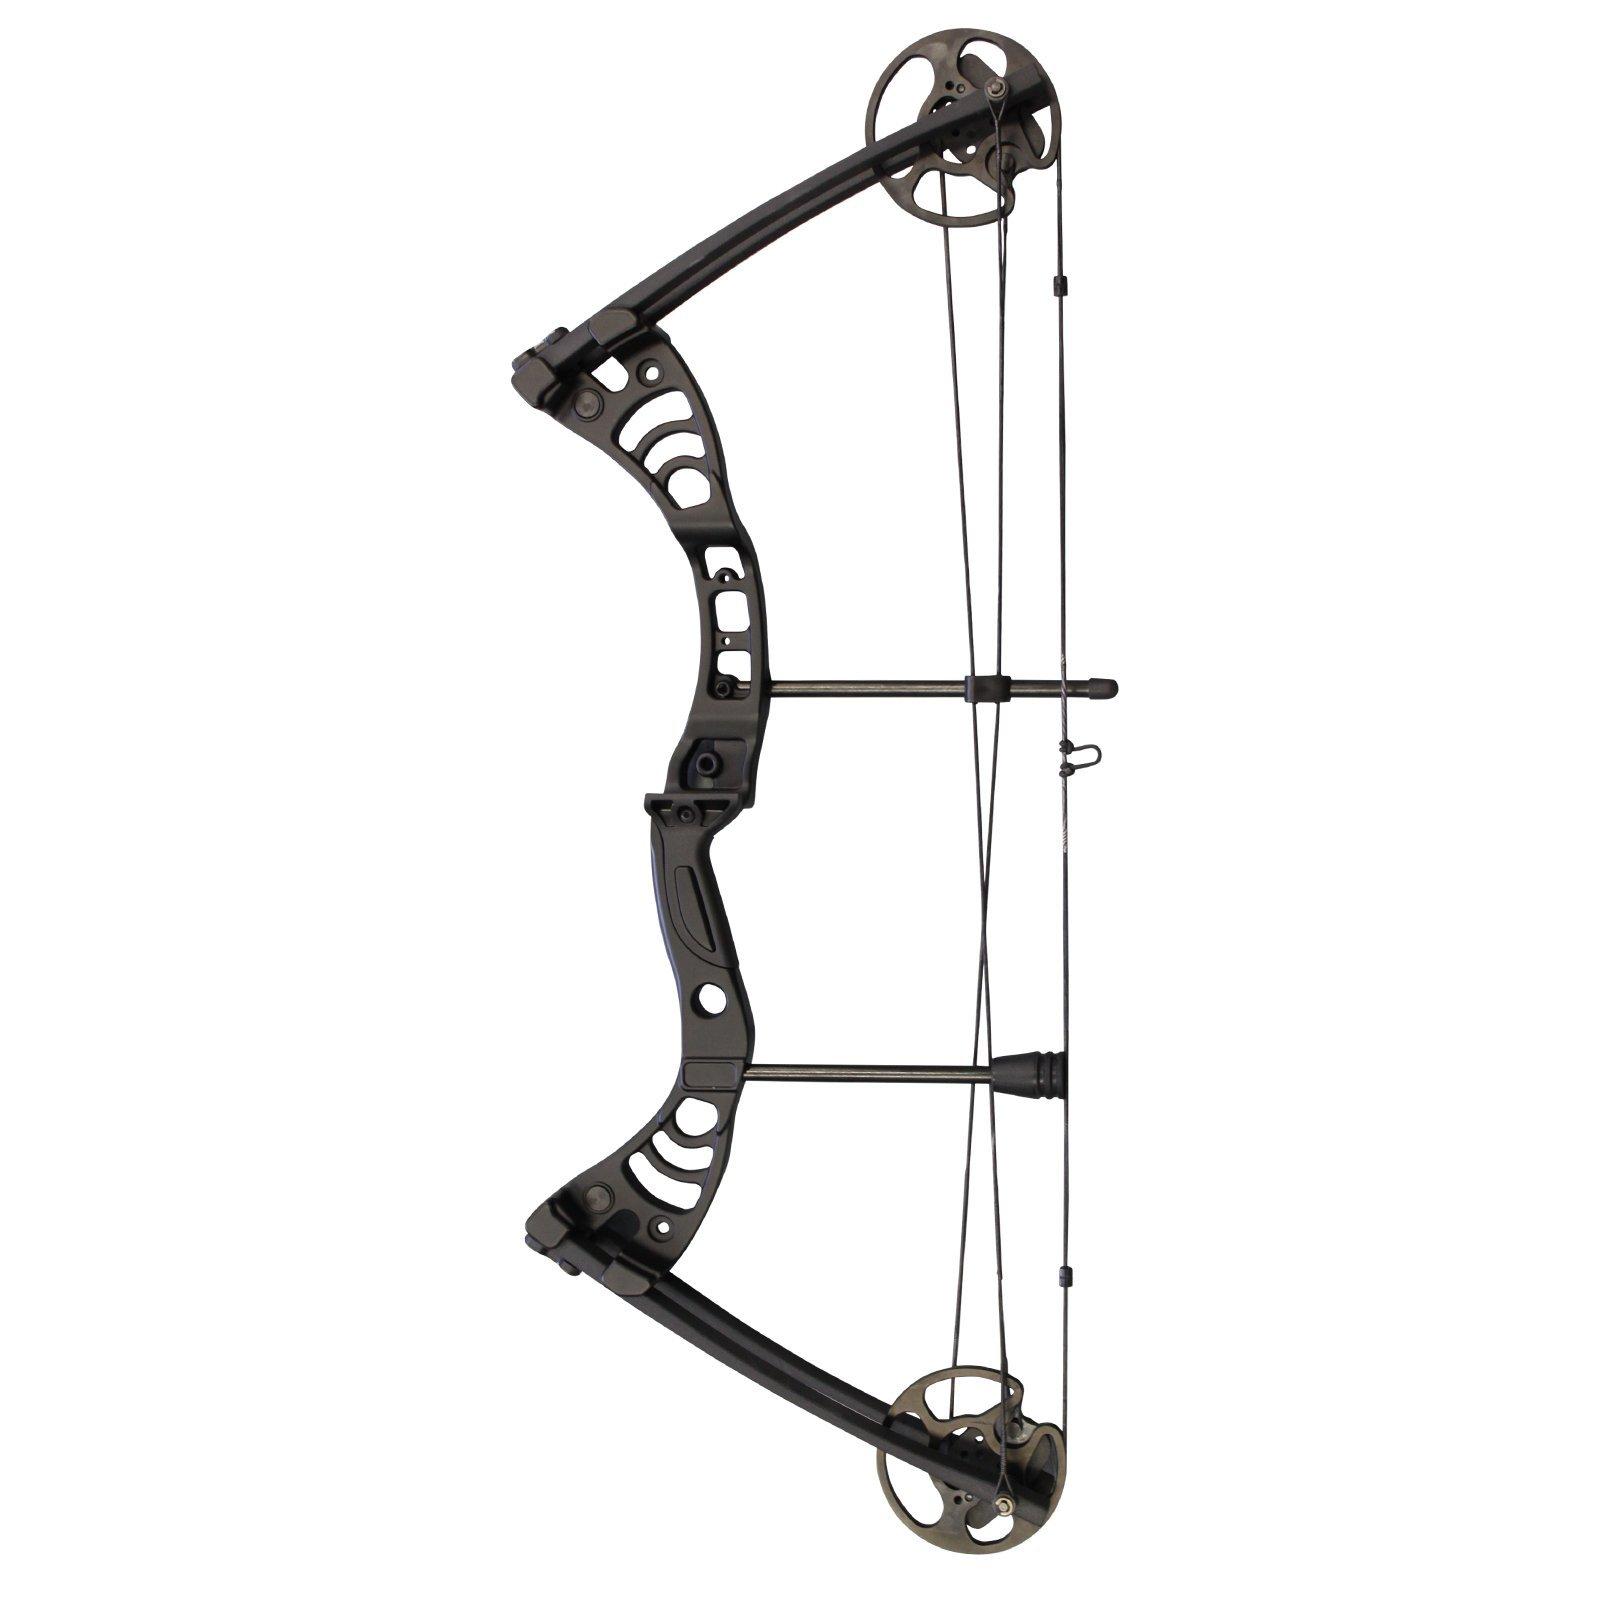 Southland Archery Supply SAS Scorpii 55 Lb 32'' Compound Bow (Black)